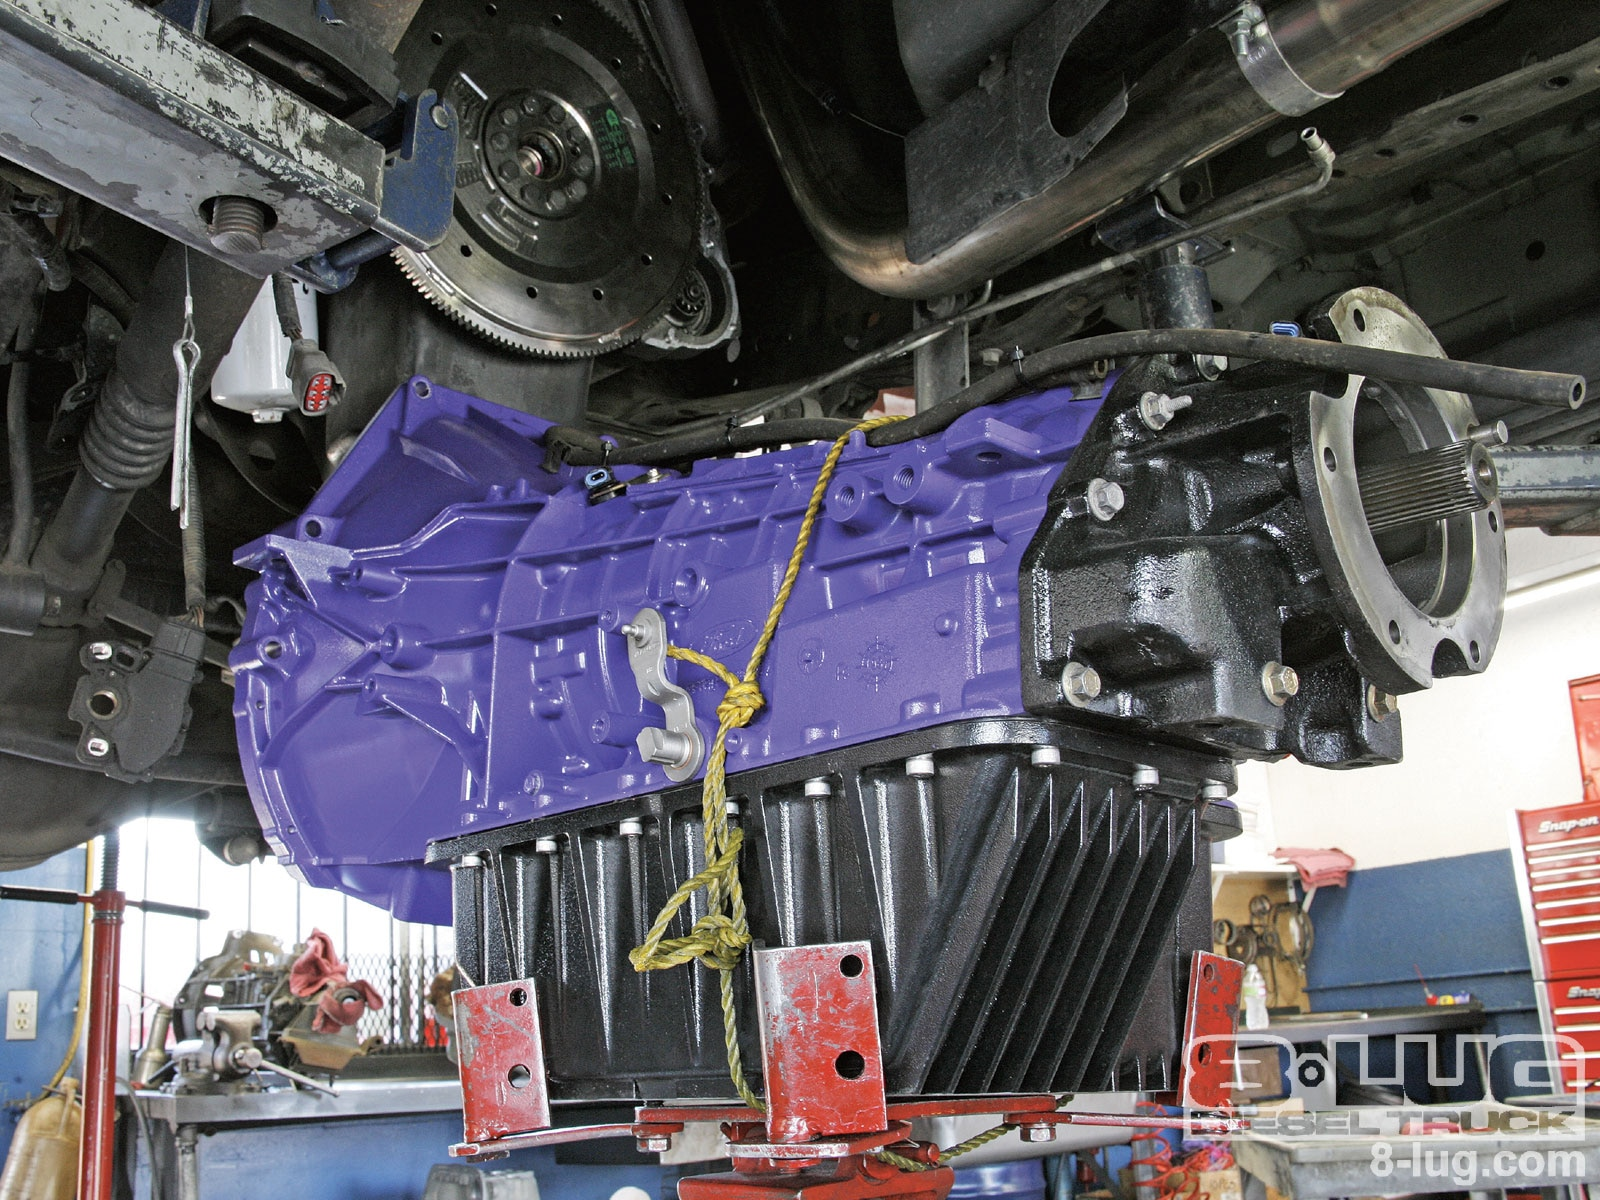 medium resolution of ford f350 transmission swap the big purple tranny photo gallery